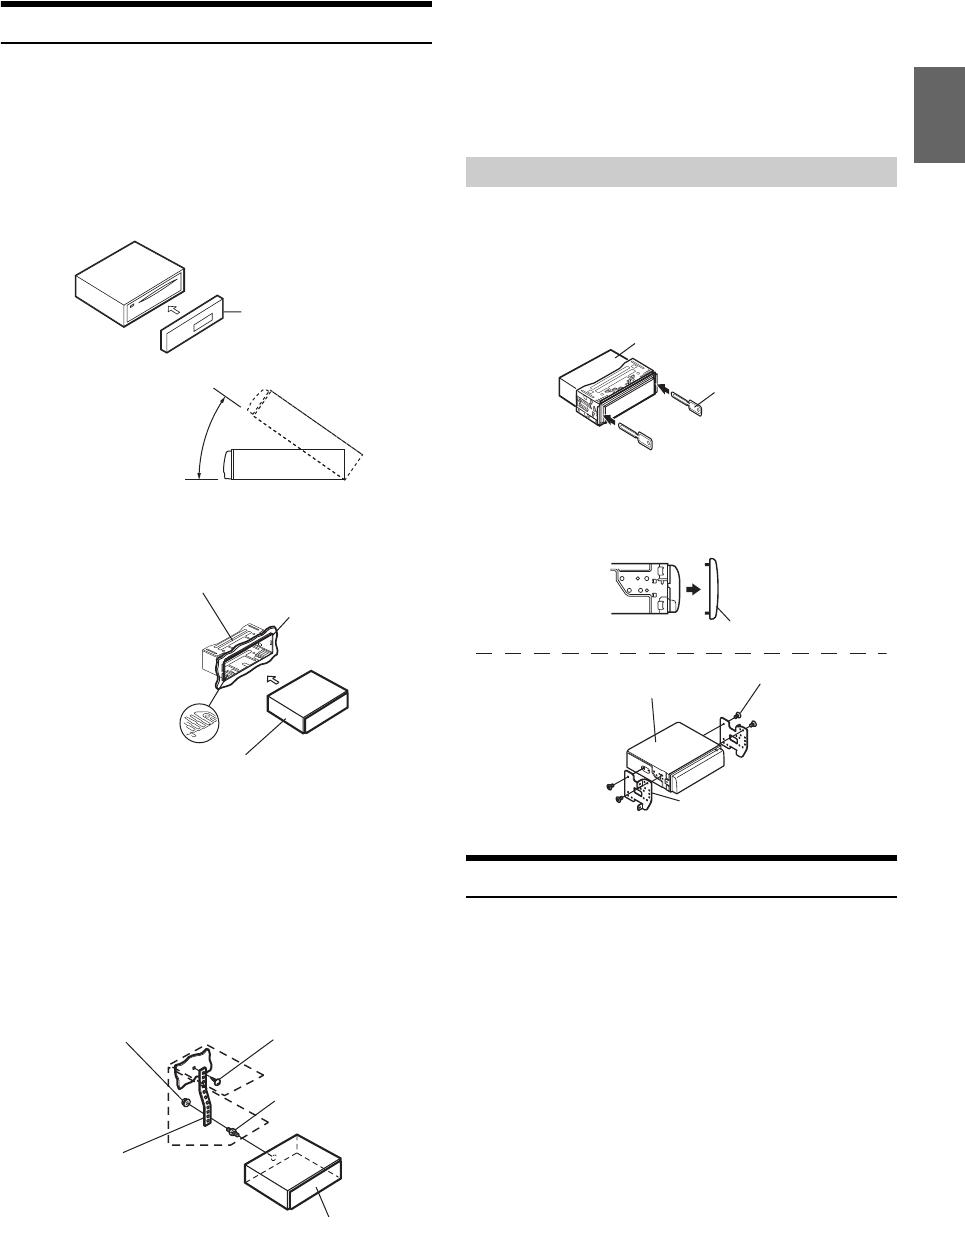 hight resolution of alpine ute 42bt owners manual cde sxm145bt cde 143bt ute 43 en alpine sxm145bt car stereo wiring diagram